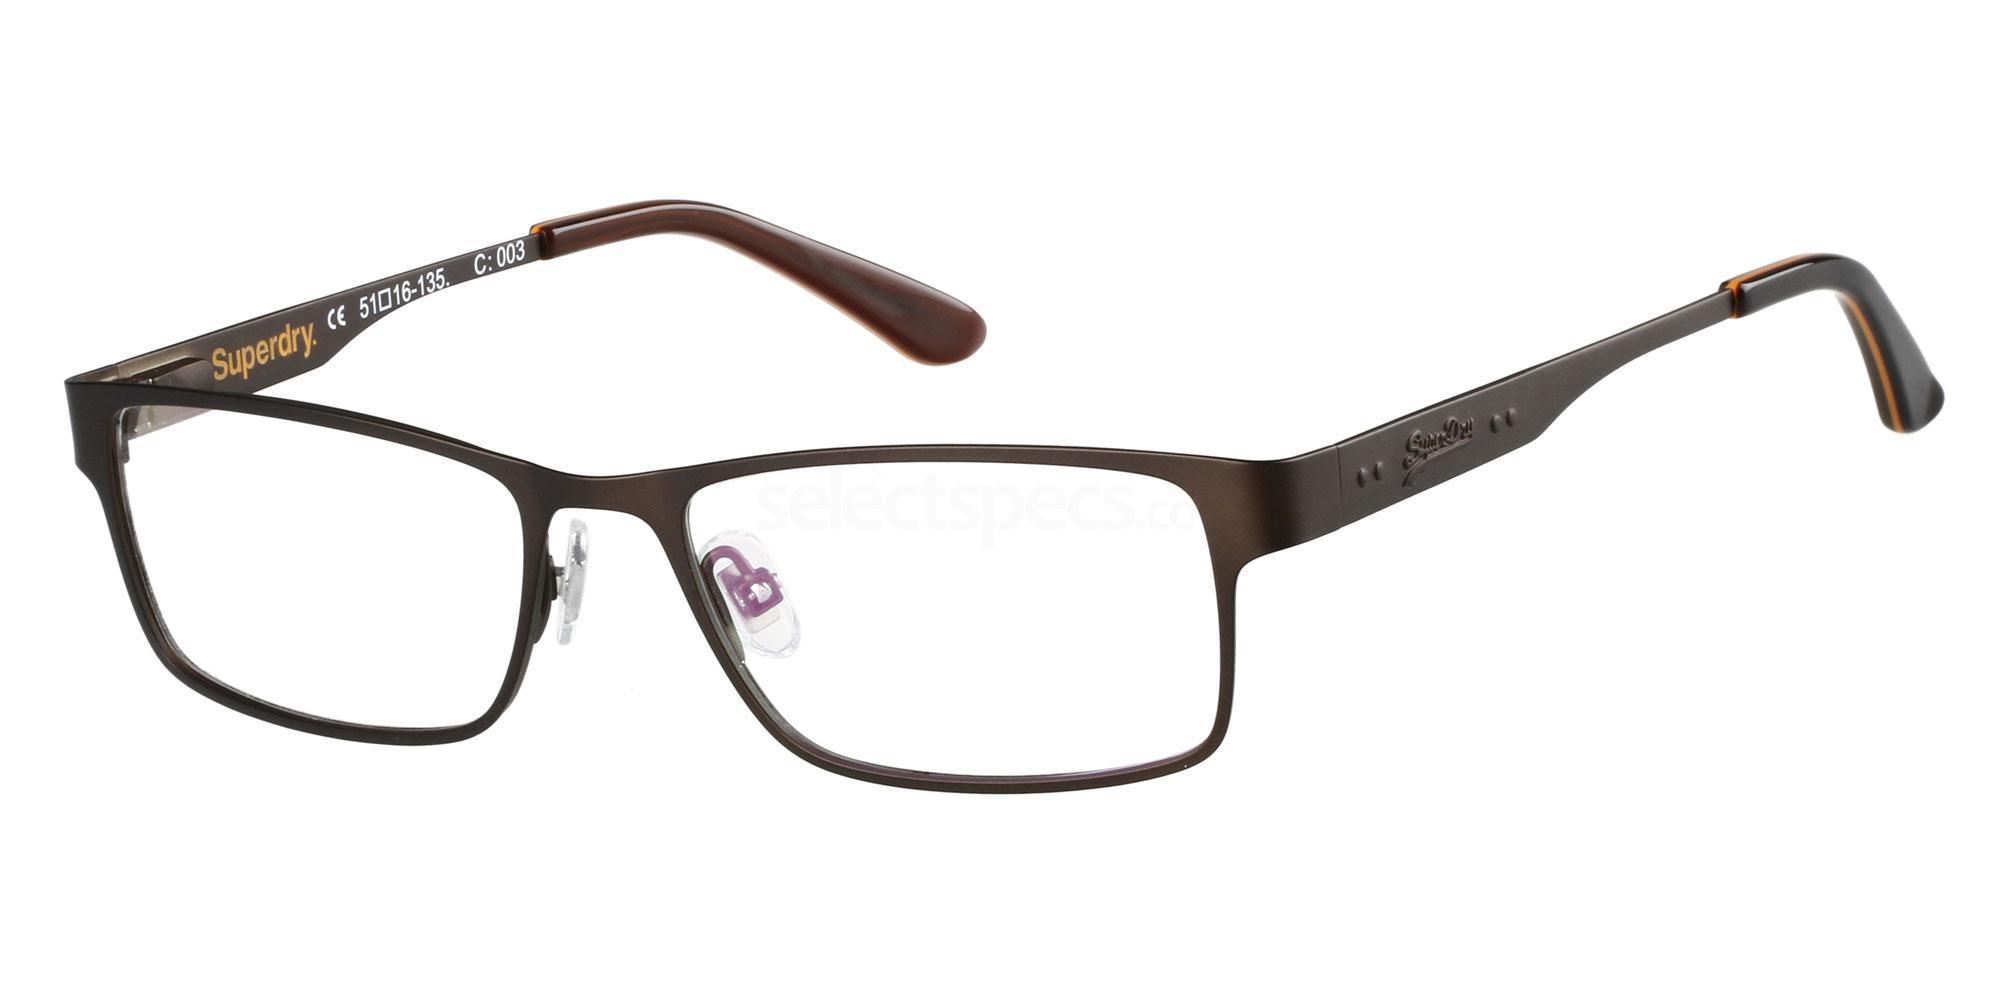 003 SDO-BROOKLYN Glasses, Superdry